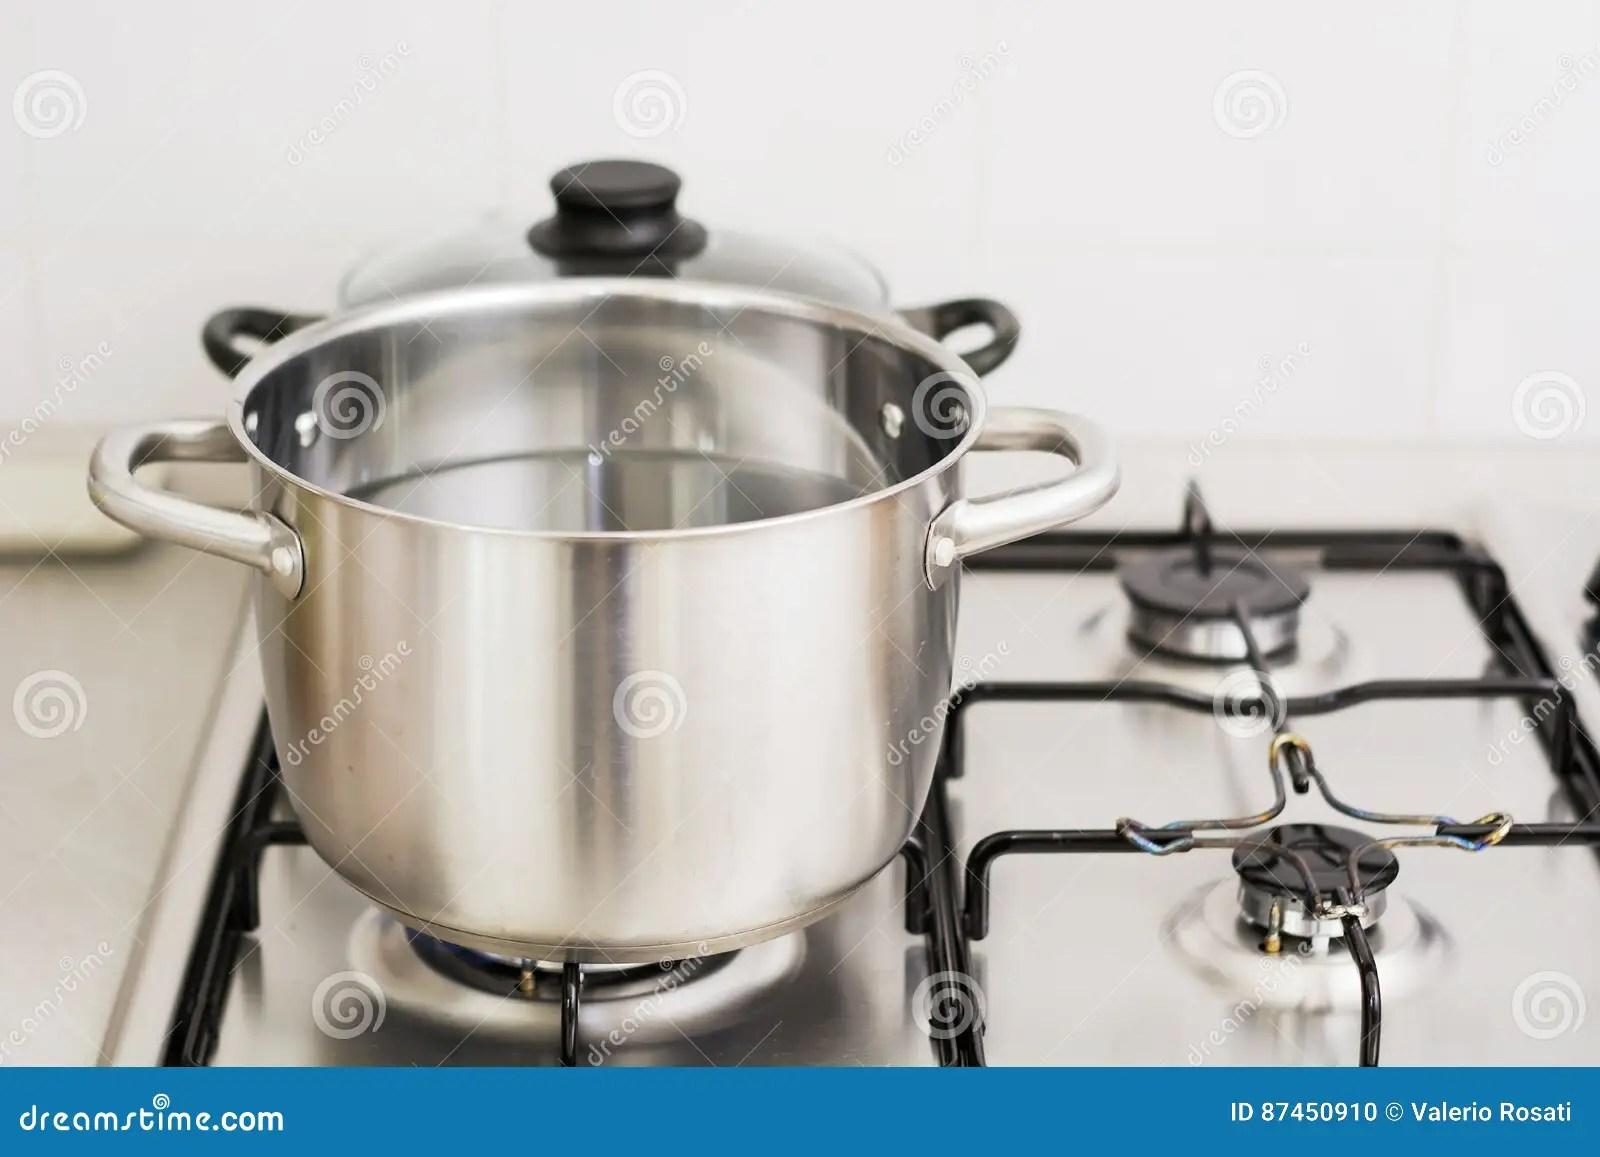 kitchen canister tabletops 在烹调气体厨房罐不锈钢火炉utensiles墙壁之后库存照片 图片包括有丙烷 在烹调气体厨房罐不锈钢火炉utensiles墙壁之后